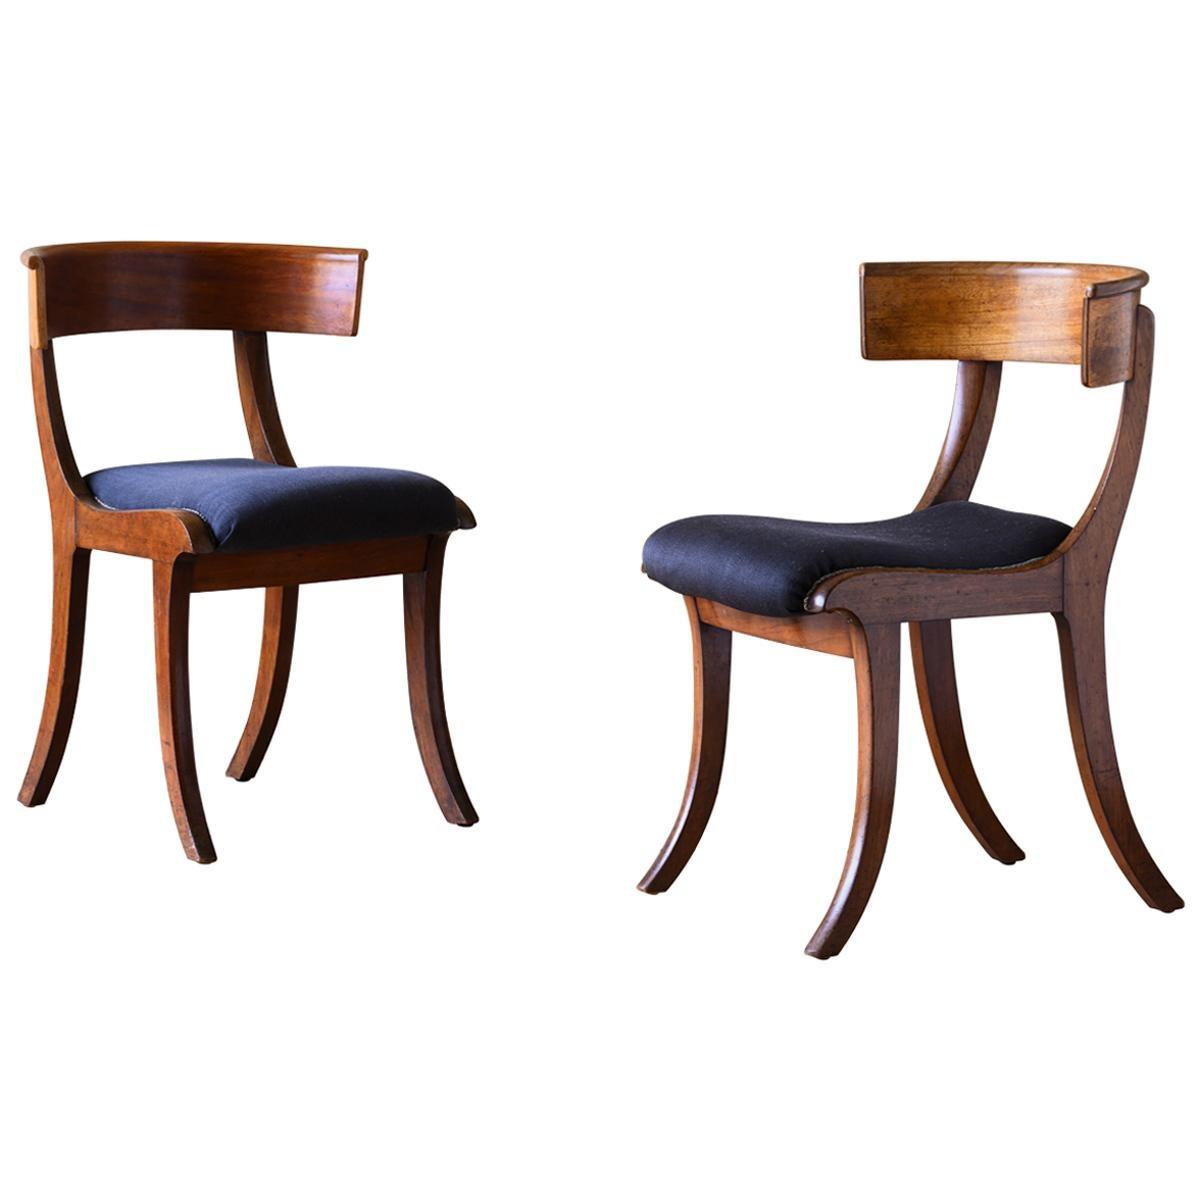 Fine Pair of 19th Century Empire Klismos Chairs